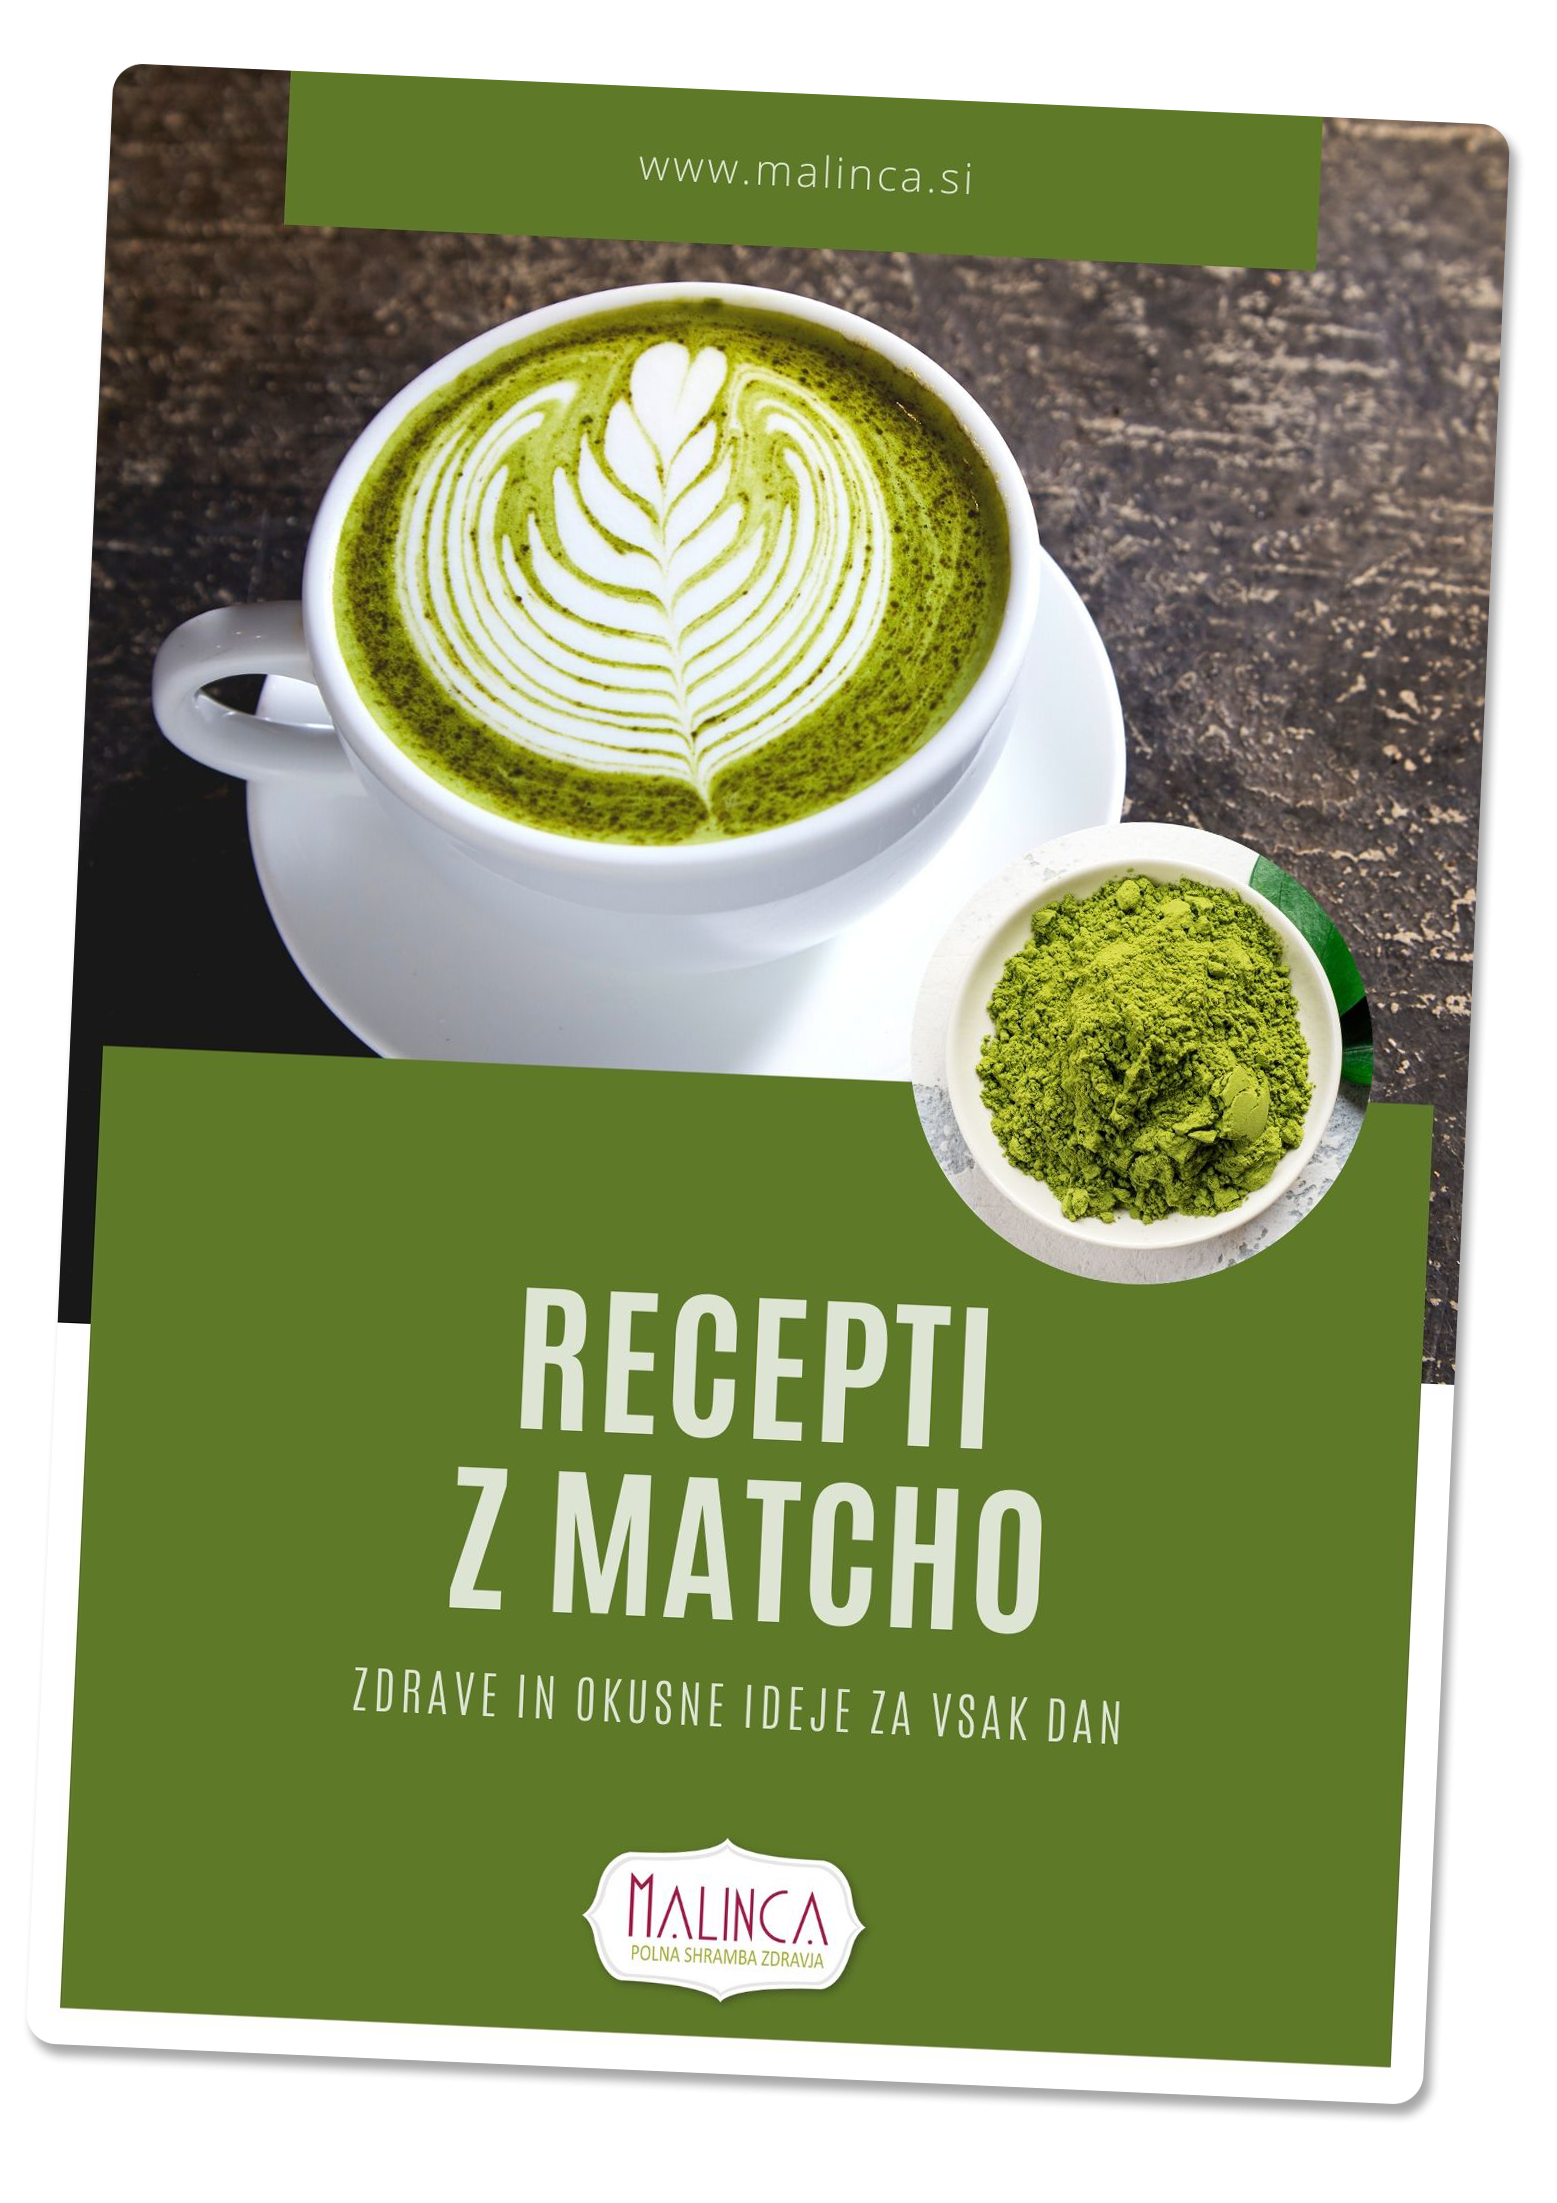 Recepti z Matcho